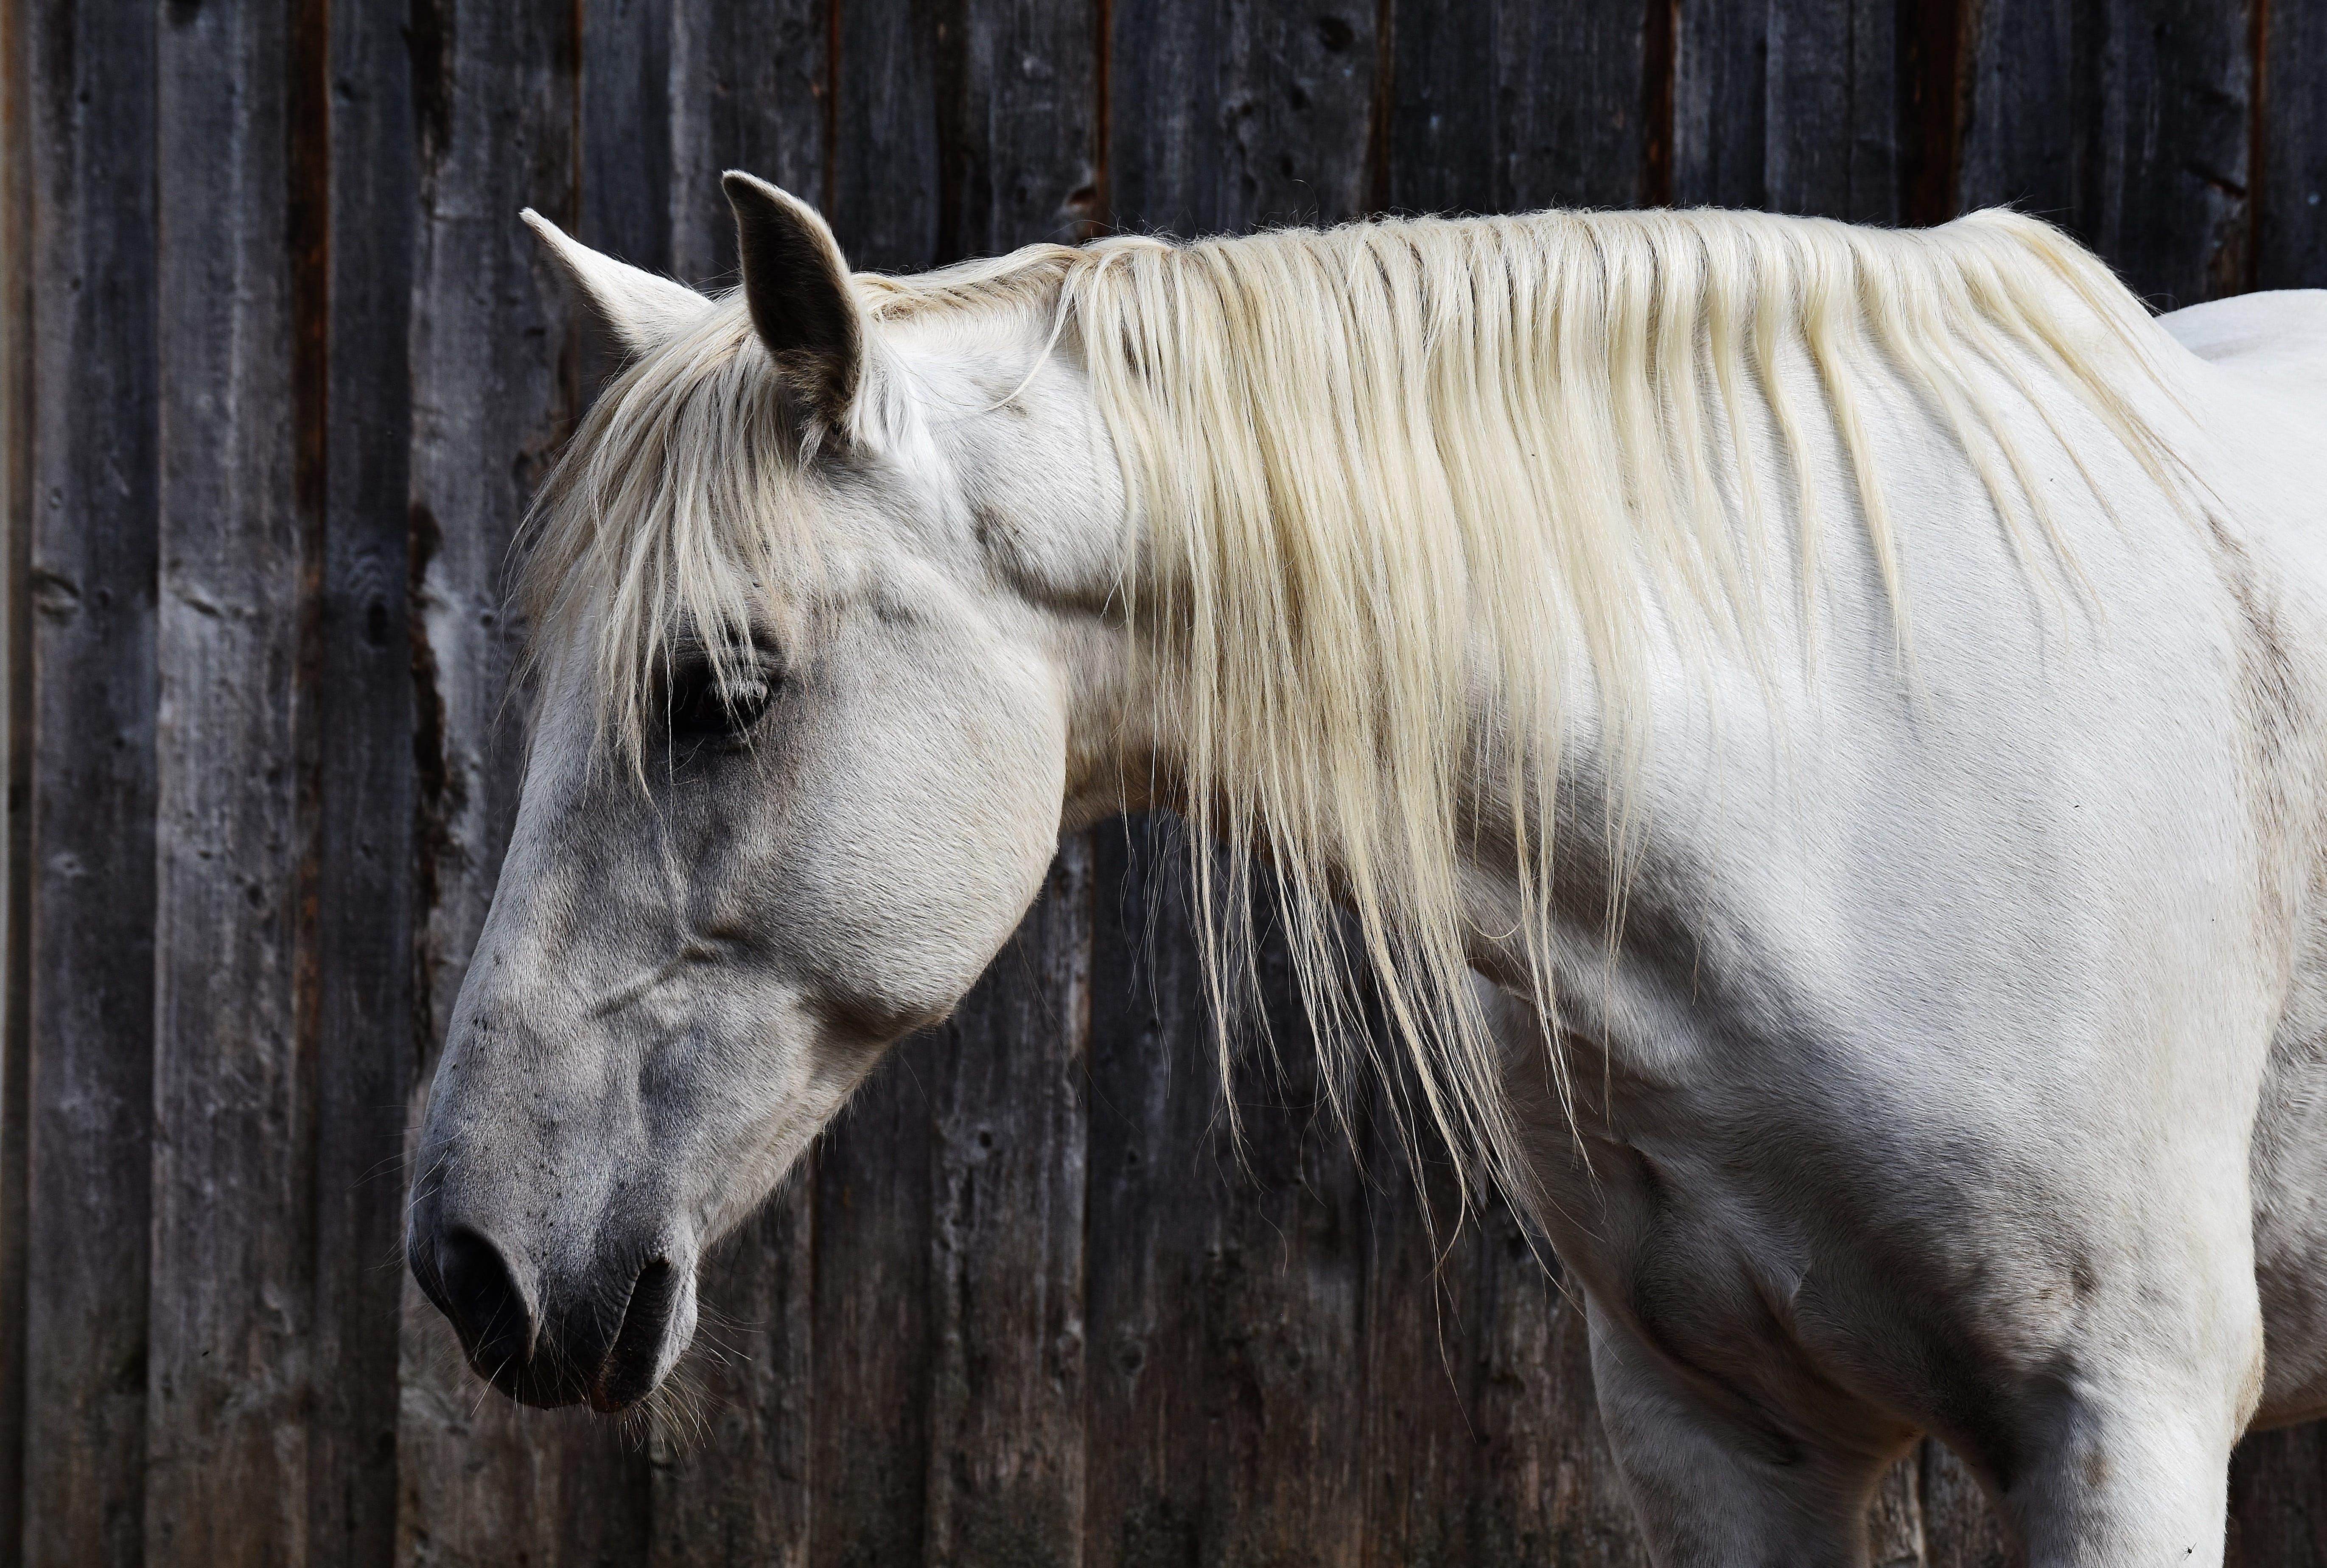 animal, equine, head